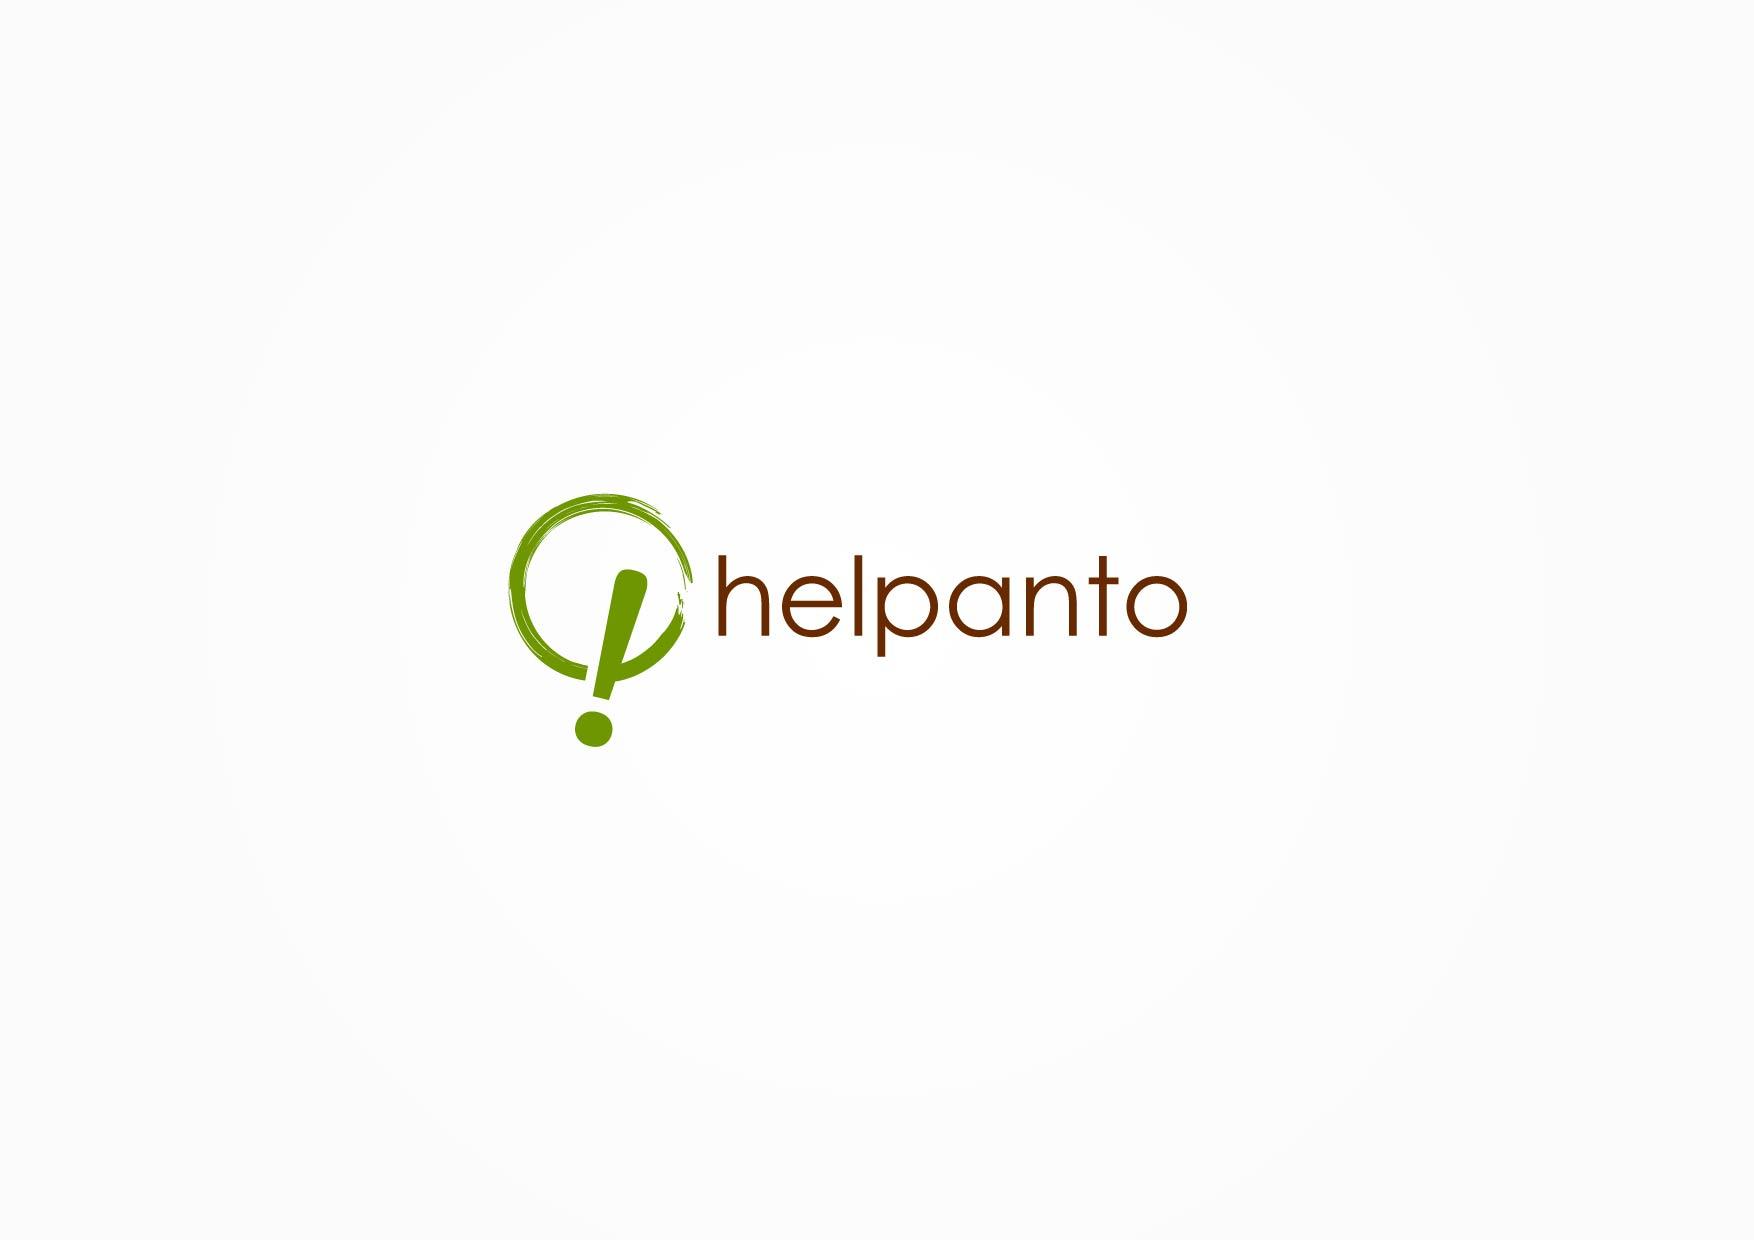 Logo Design by Osi Indra - Entry No. 49 in the Logo Design Contest Artistic Logo Design for helpanto.